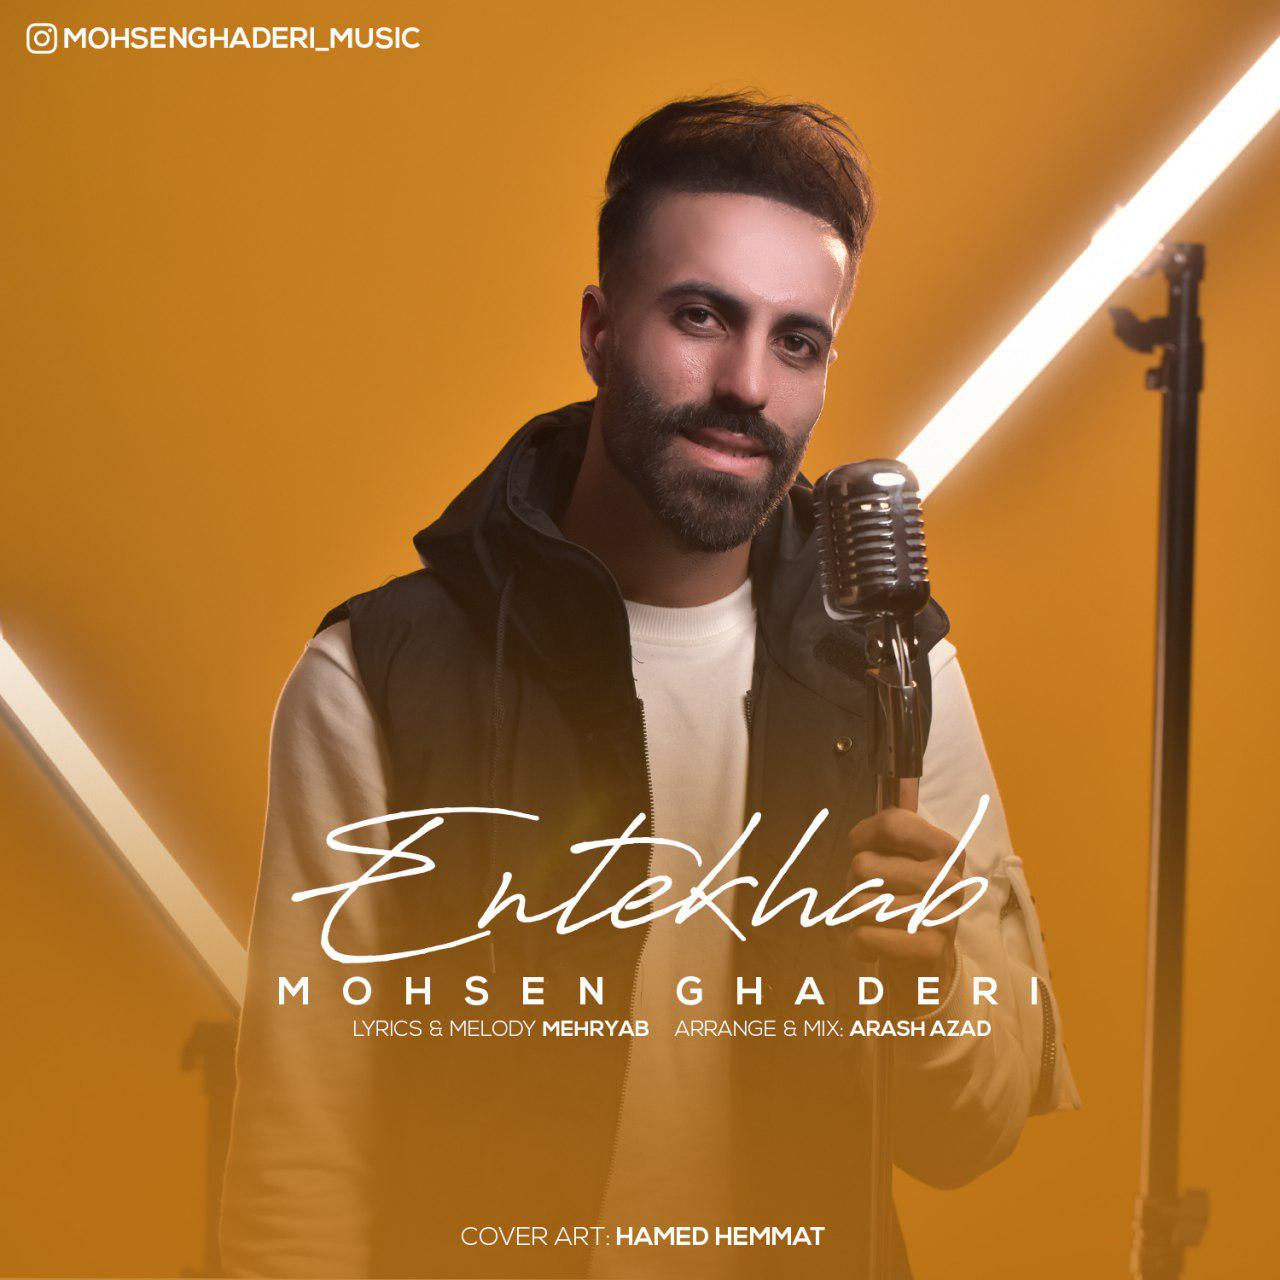 Mohsen Ghaderi – Entekhab